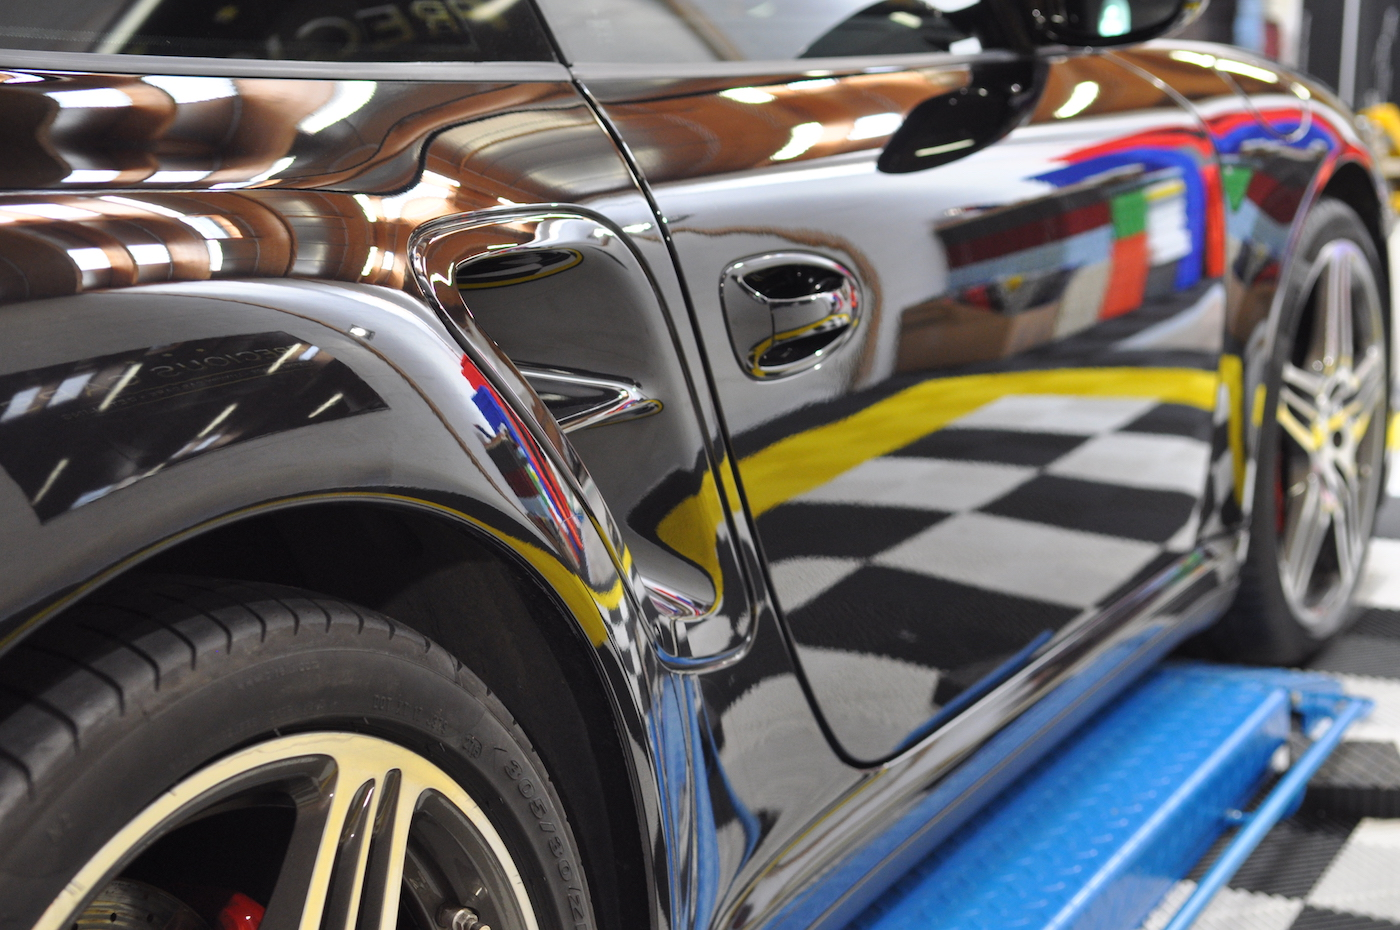 Swissvax Le Mans - Porsche 997 Turbo